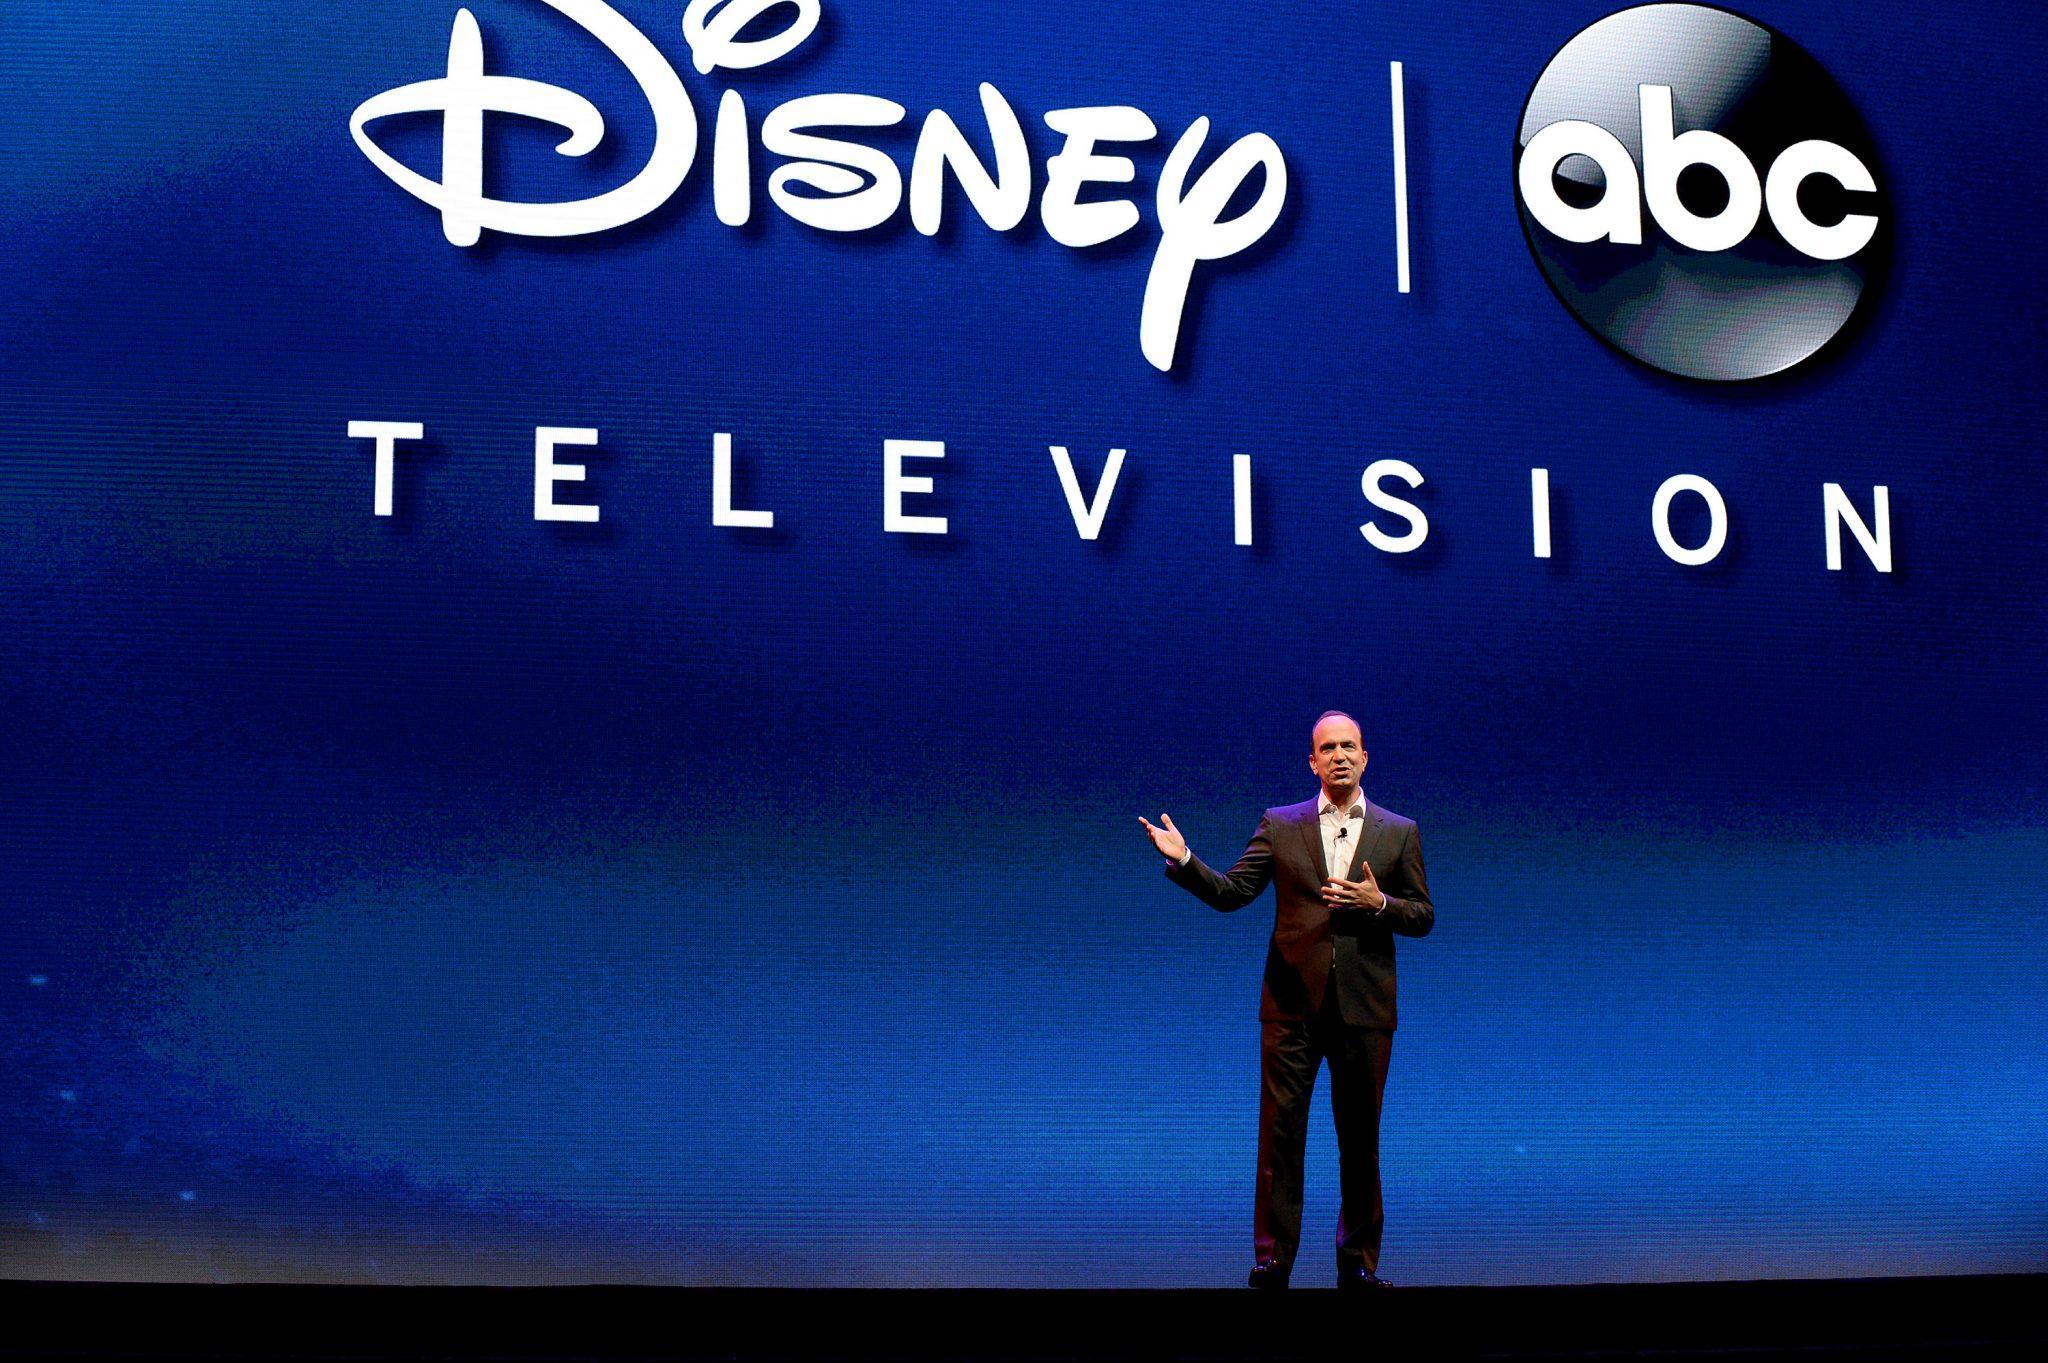 Ben Sherwood presents at the Disney International Upfront (Phot credit: Disney/Mitch Haddad)